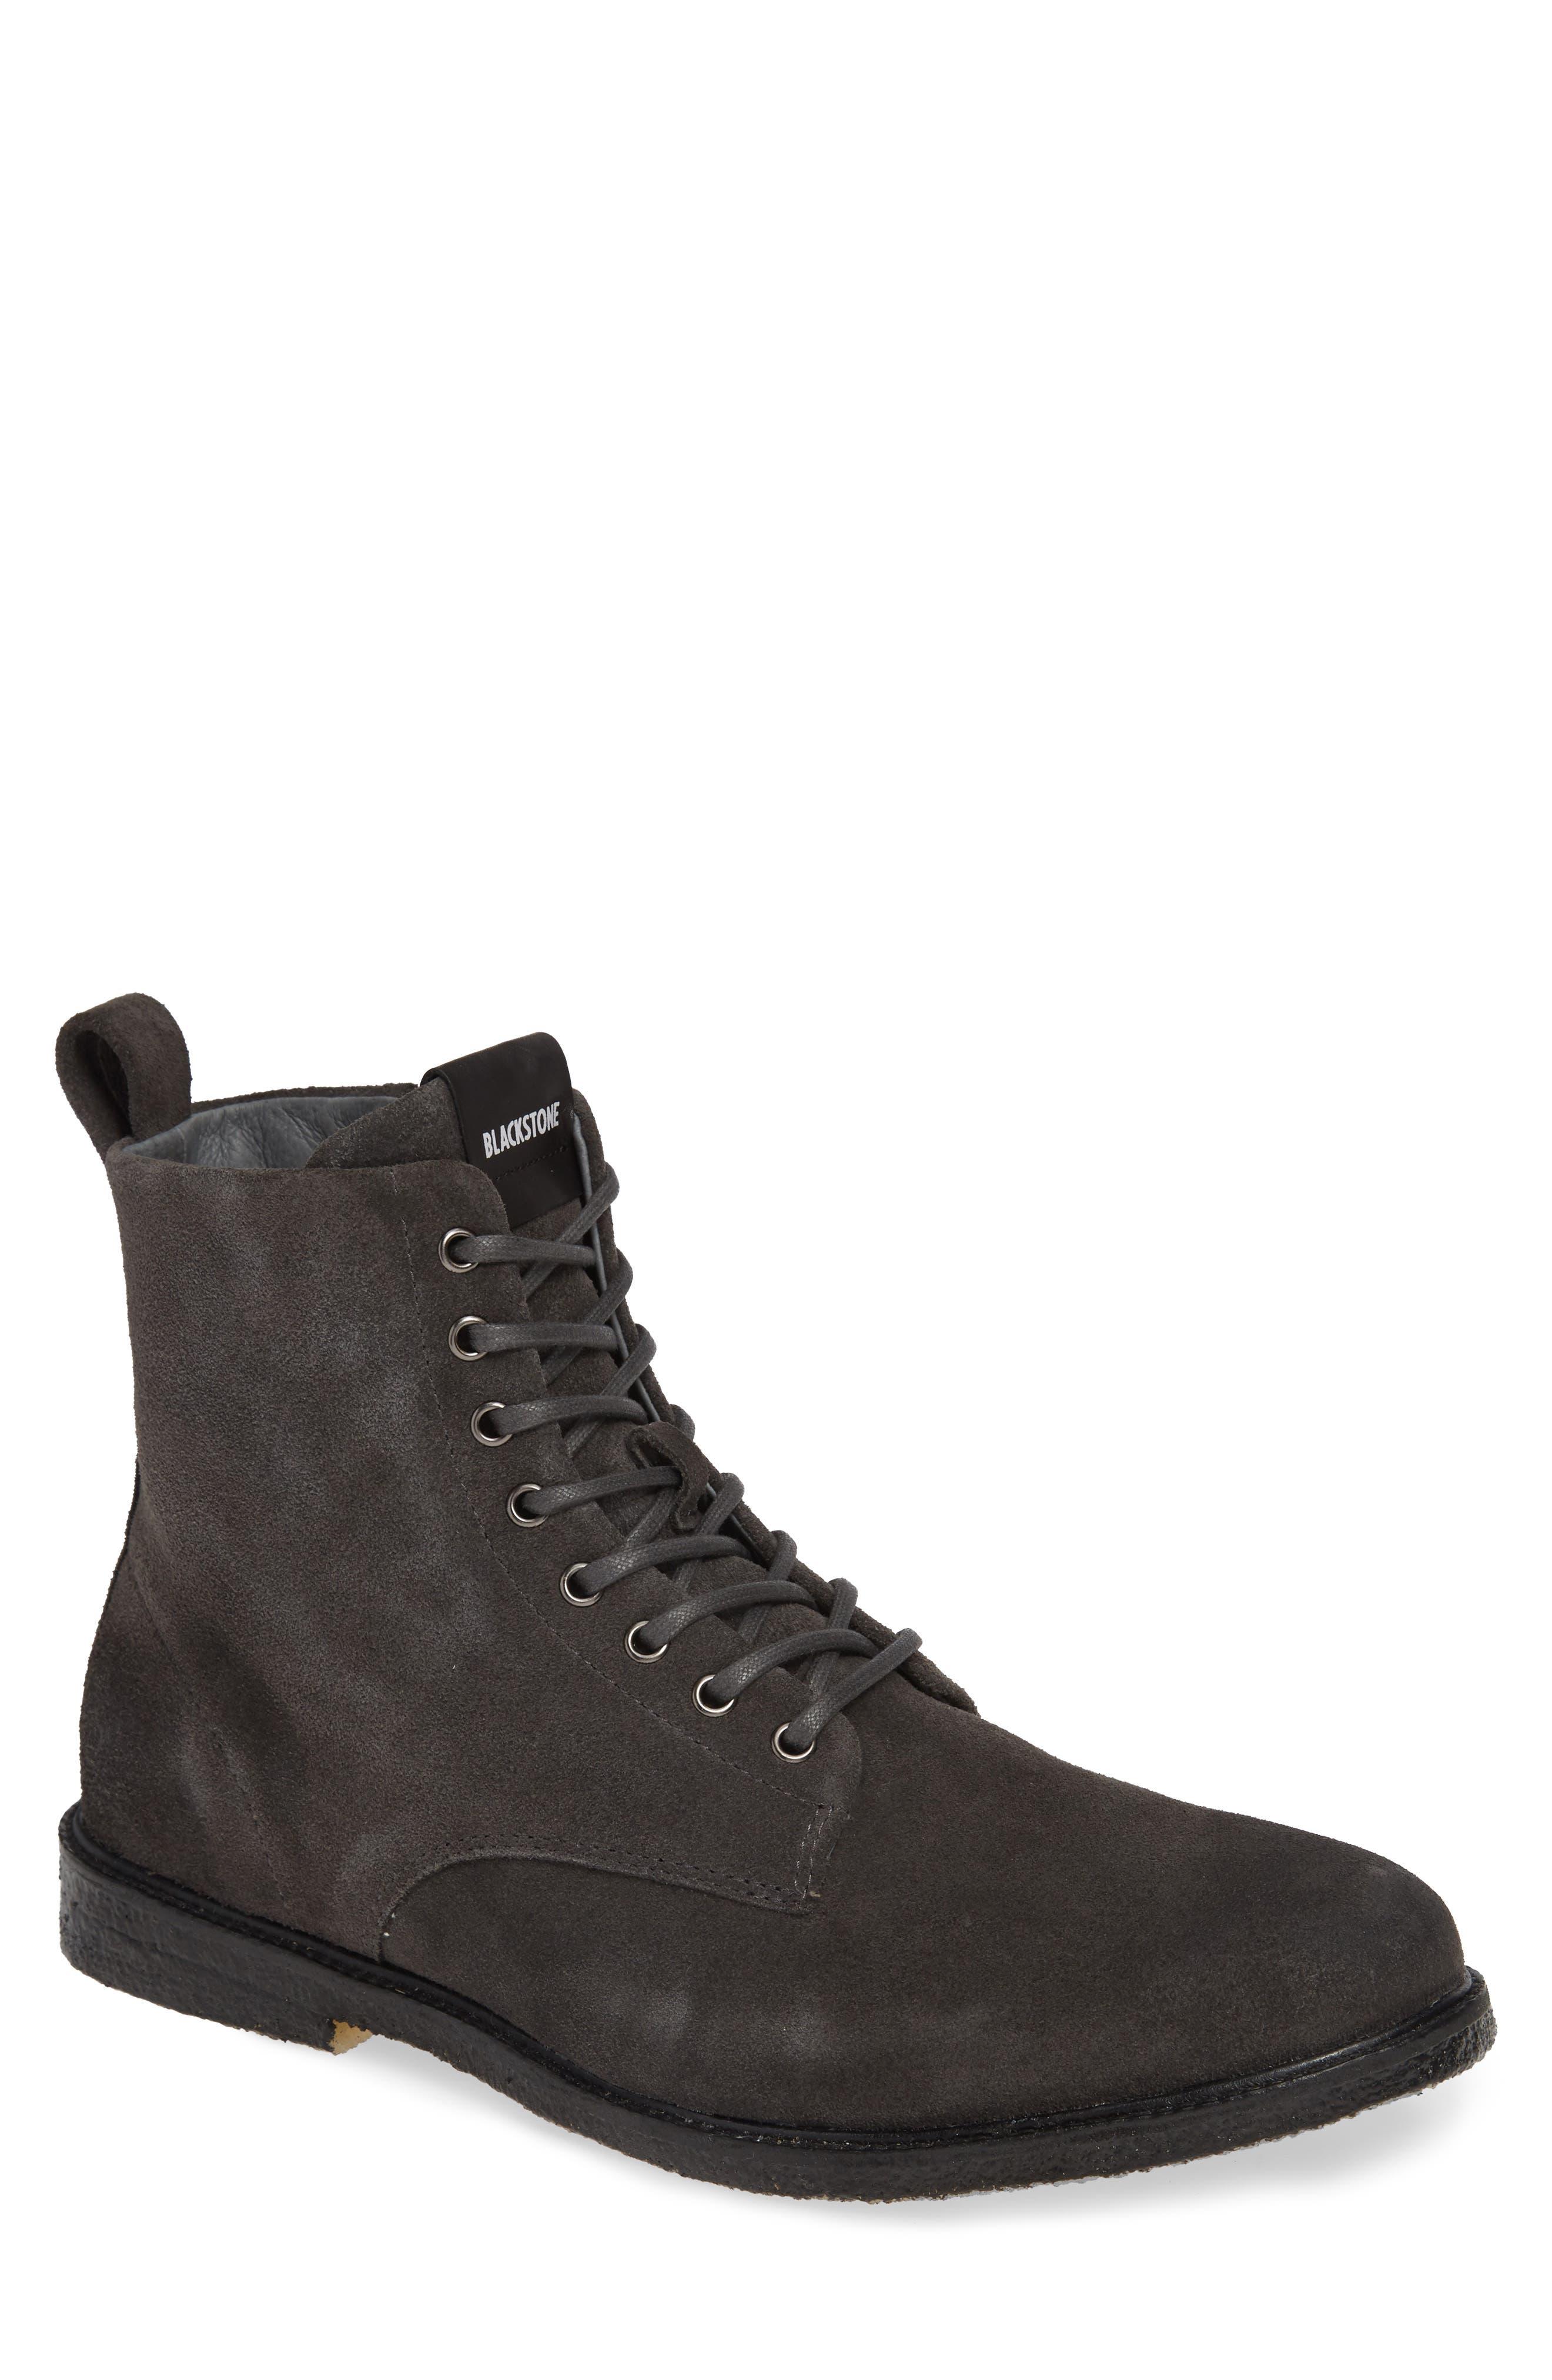 Qm23 Plain Toe Boot